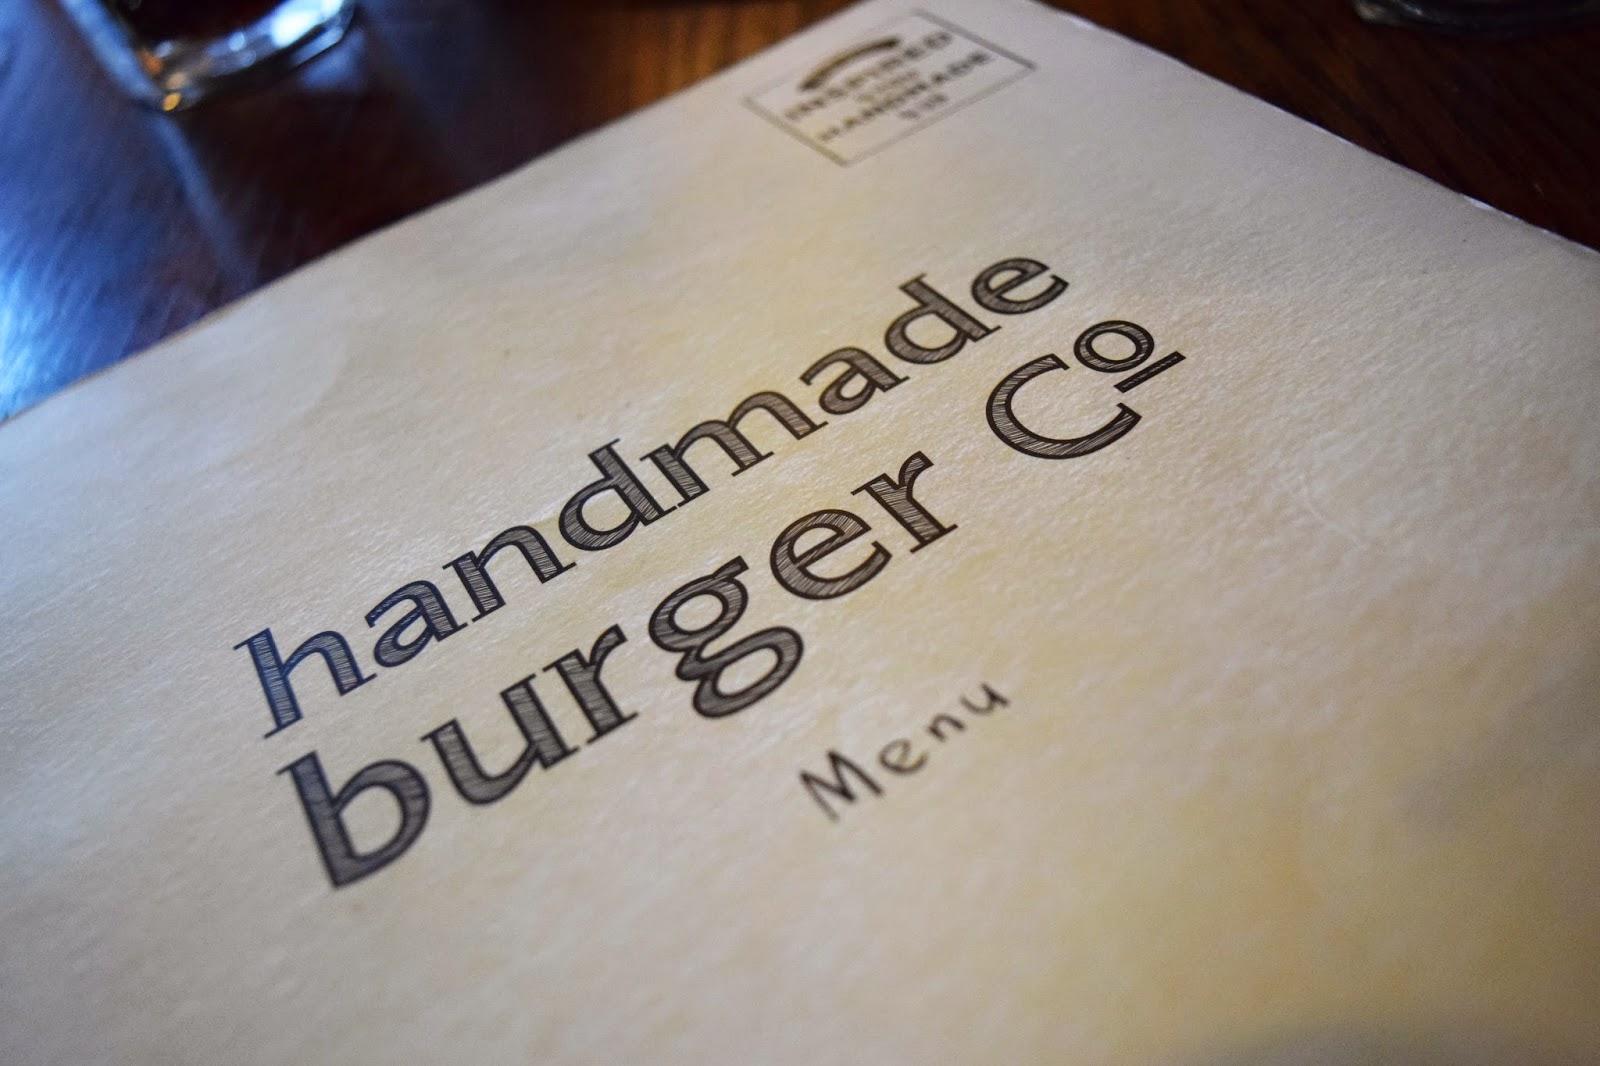 The Handmade burger menu